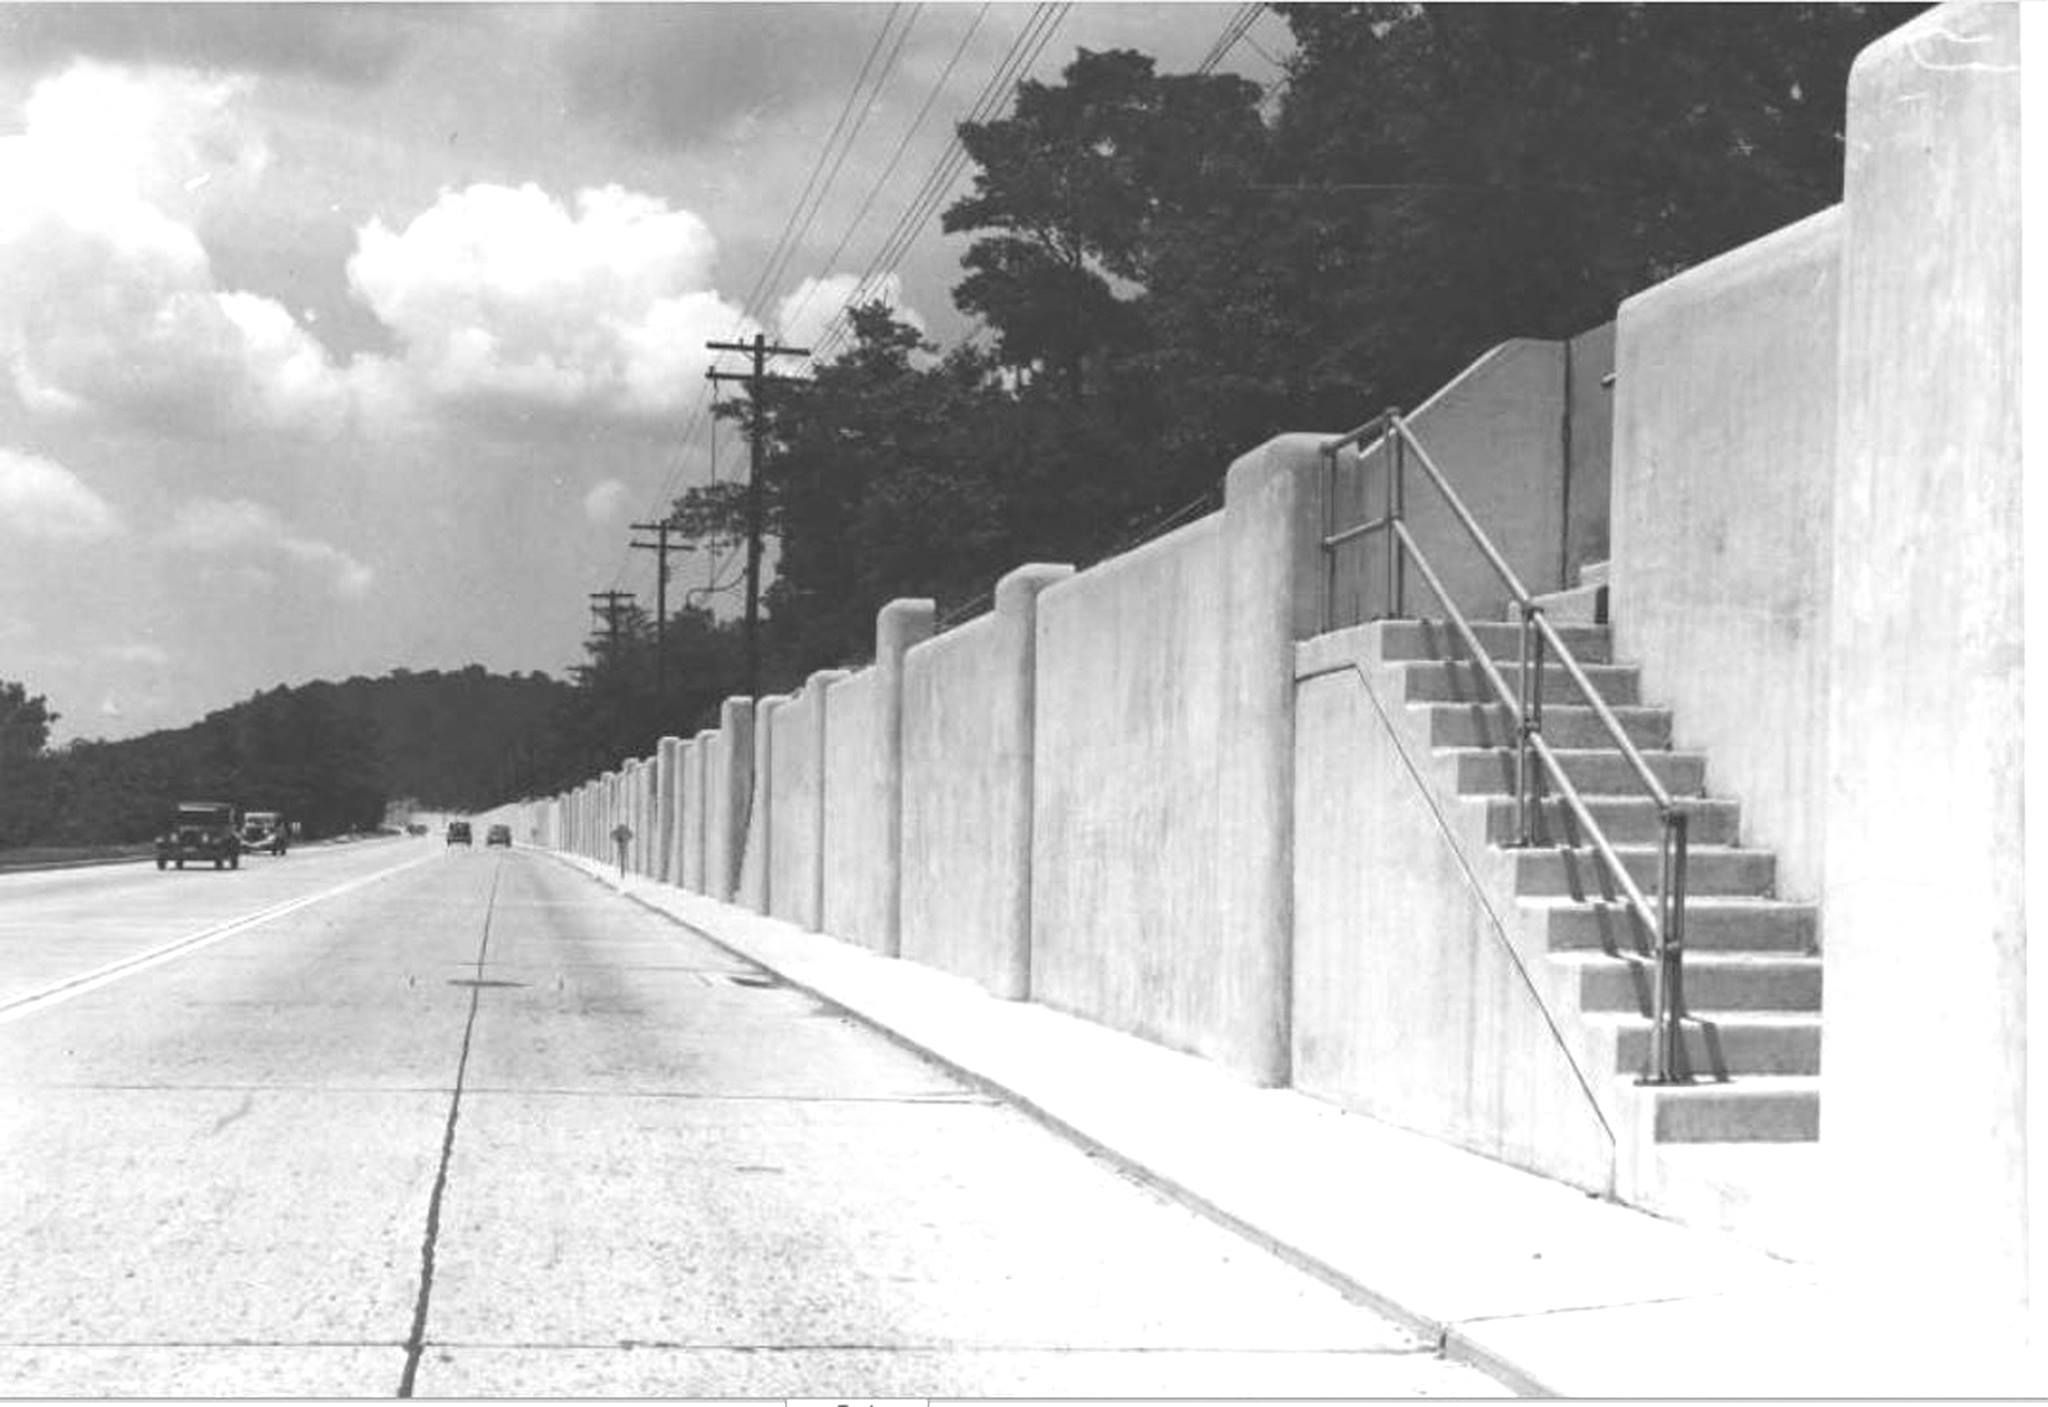 Columbia Pkwy late 1930's. Downtown cincinnati